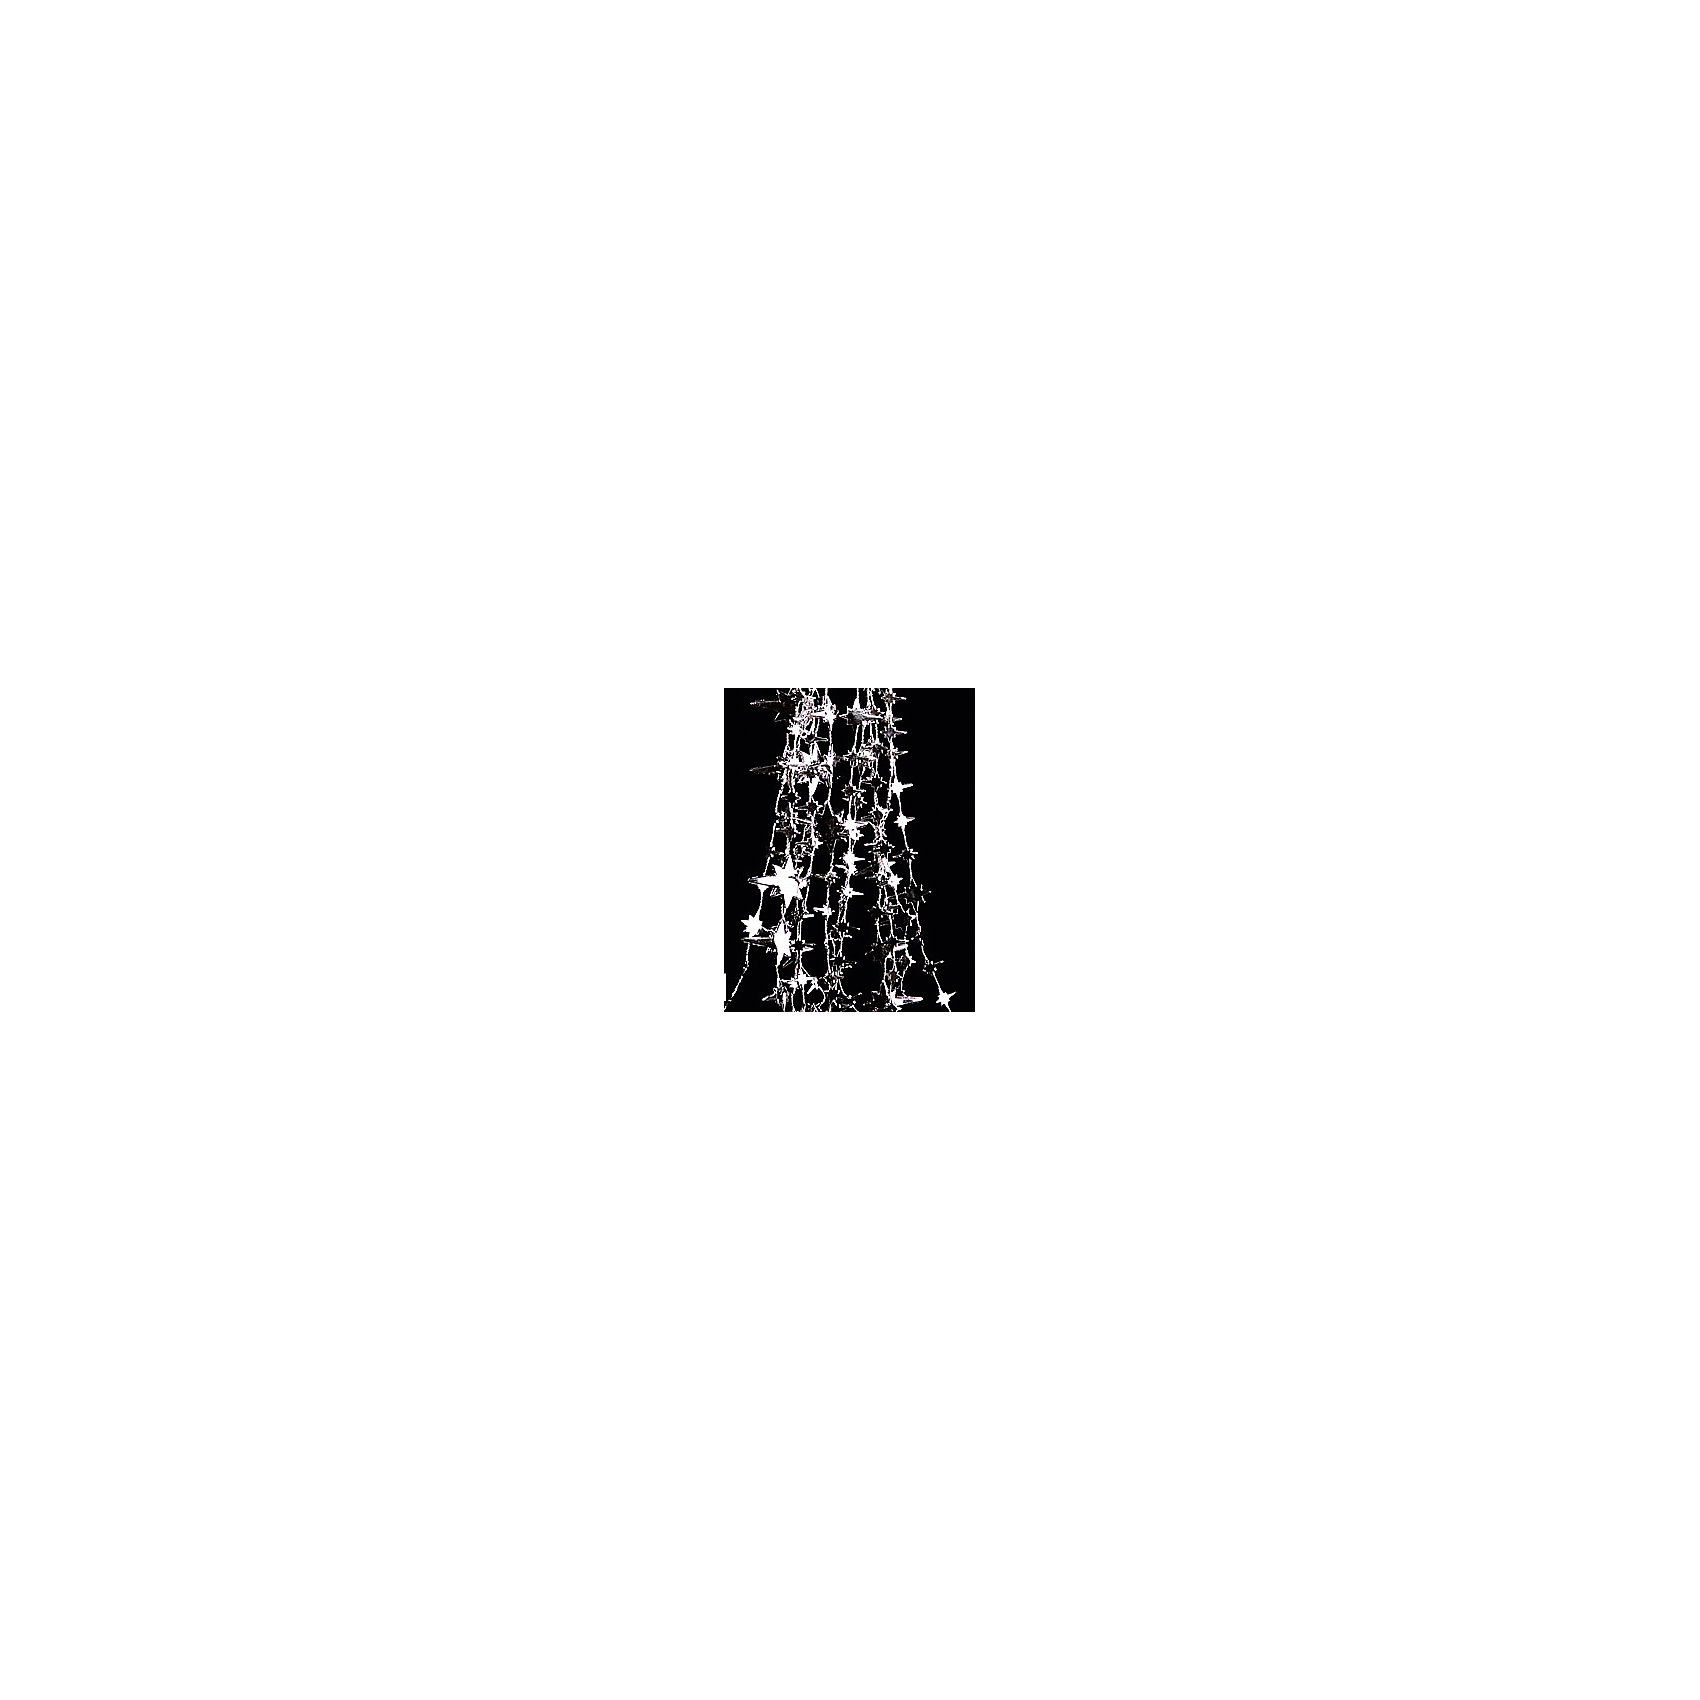 Бусы Звезды 2,7 м, сереброИзготовлено из пластмассы. ёл. укр. бусы ЗВЕЗДЫ ост, сред/мал,2,7м, серебро<br><br>Ширина мм: 120<br>Глубина мм: 10<br>Высота мм: 220<br>Вес г: 100<br>Возраст от месяцев: 36<br>Возраст до месяцев: 2147483647<br>Пол: Унисекс<br>Возраст: Детский<br>SKU: 5101093